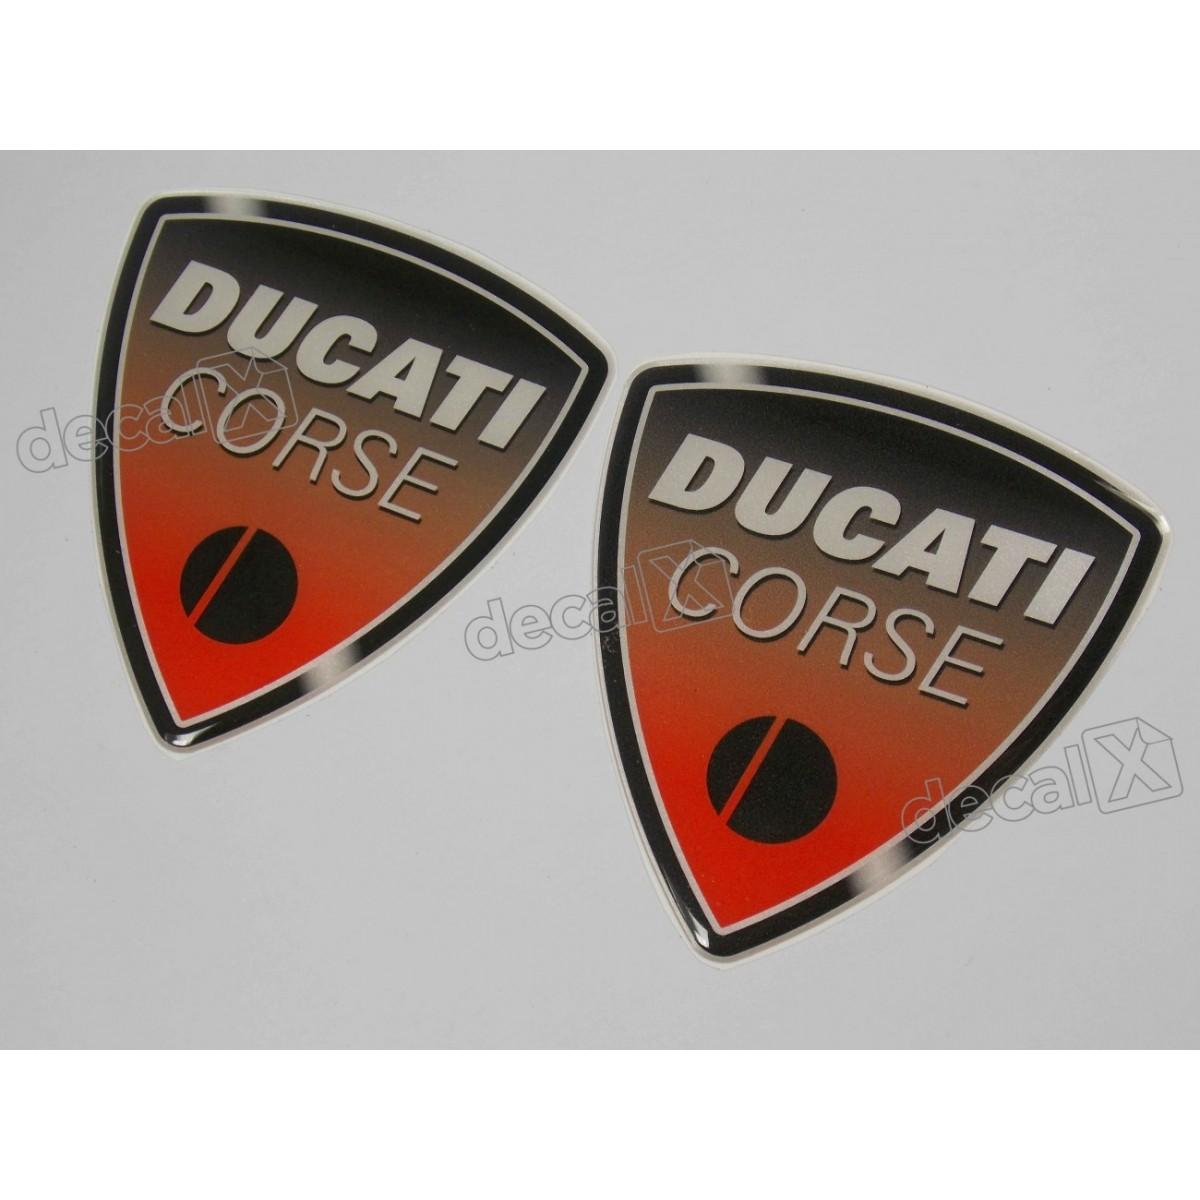 Emblema Adesivo Resinado Ducati Corse 8,5x9,0 Par Rs6